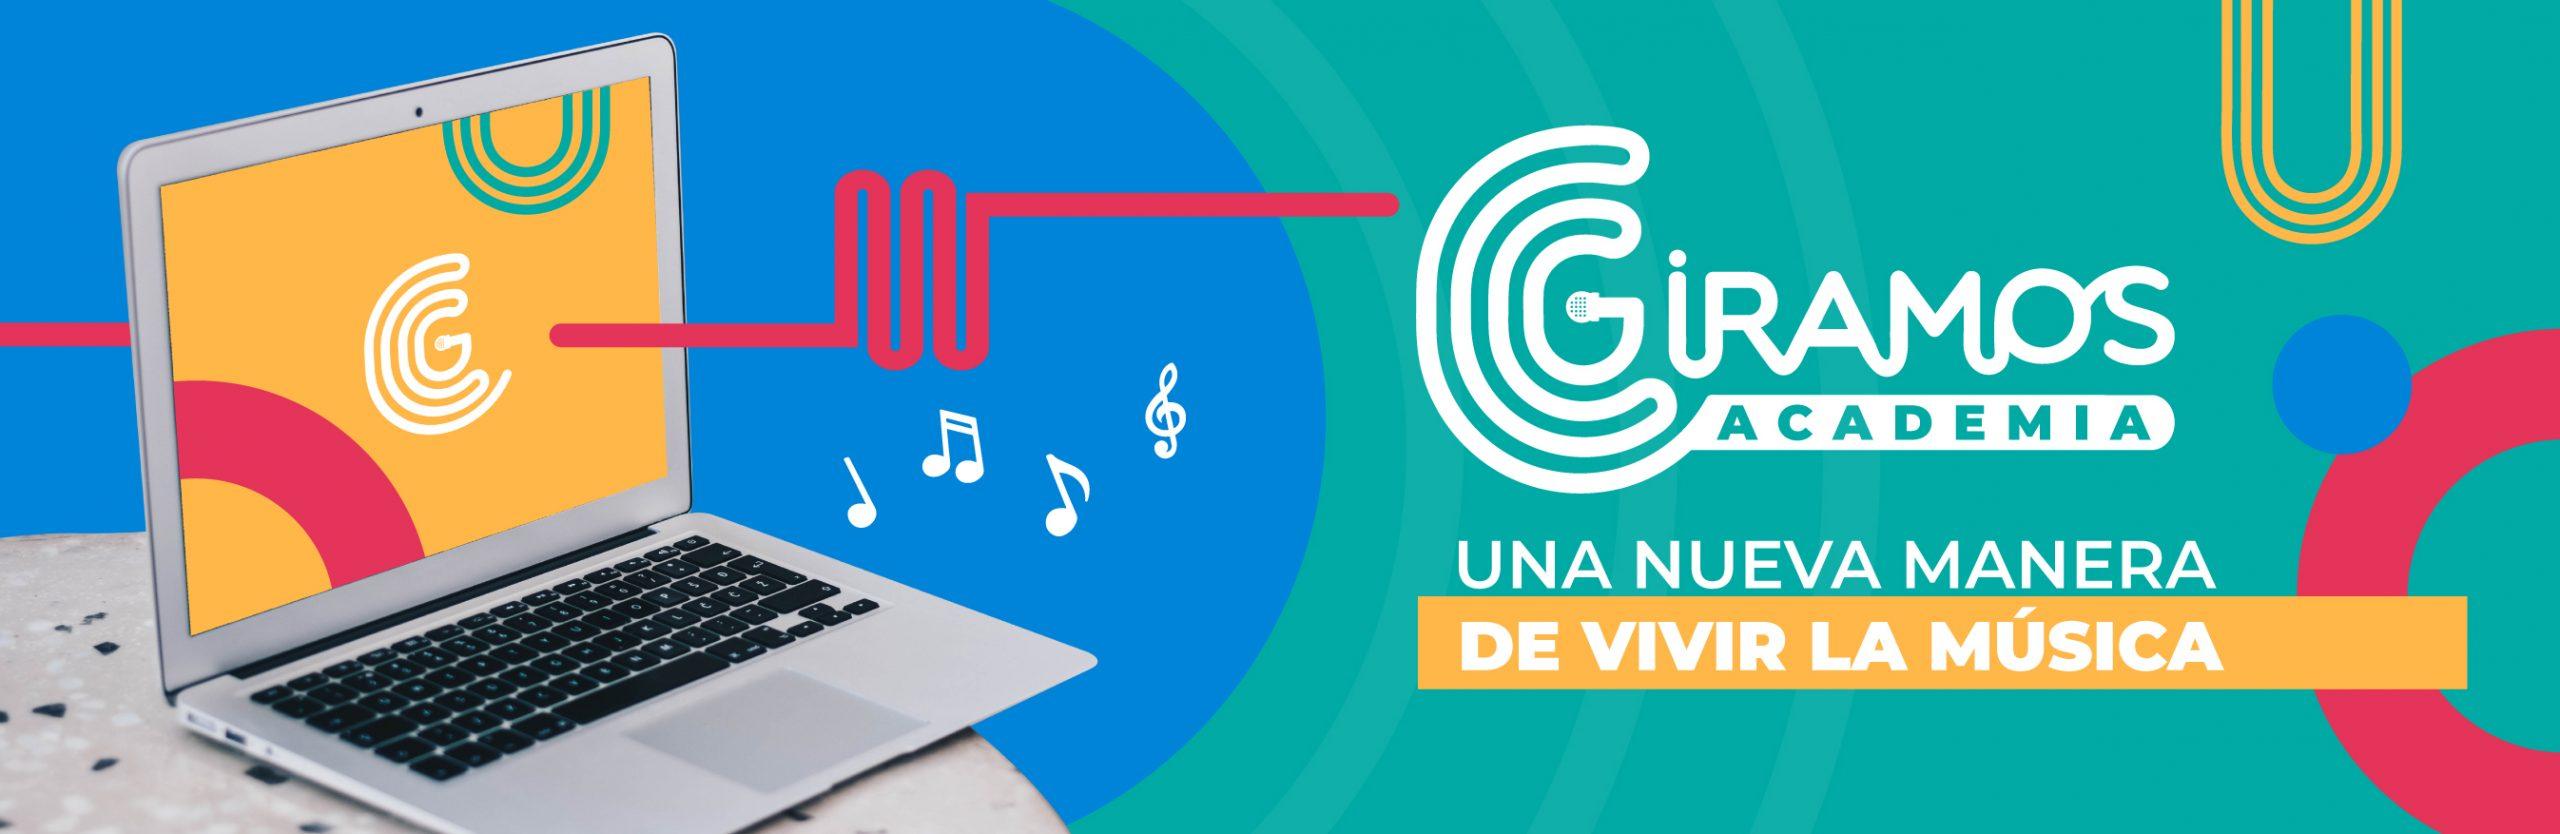 GIRAMOS ACADEMIA: Primera plataforma educativa especializada en música